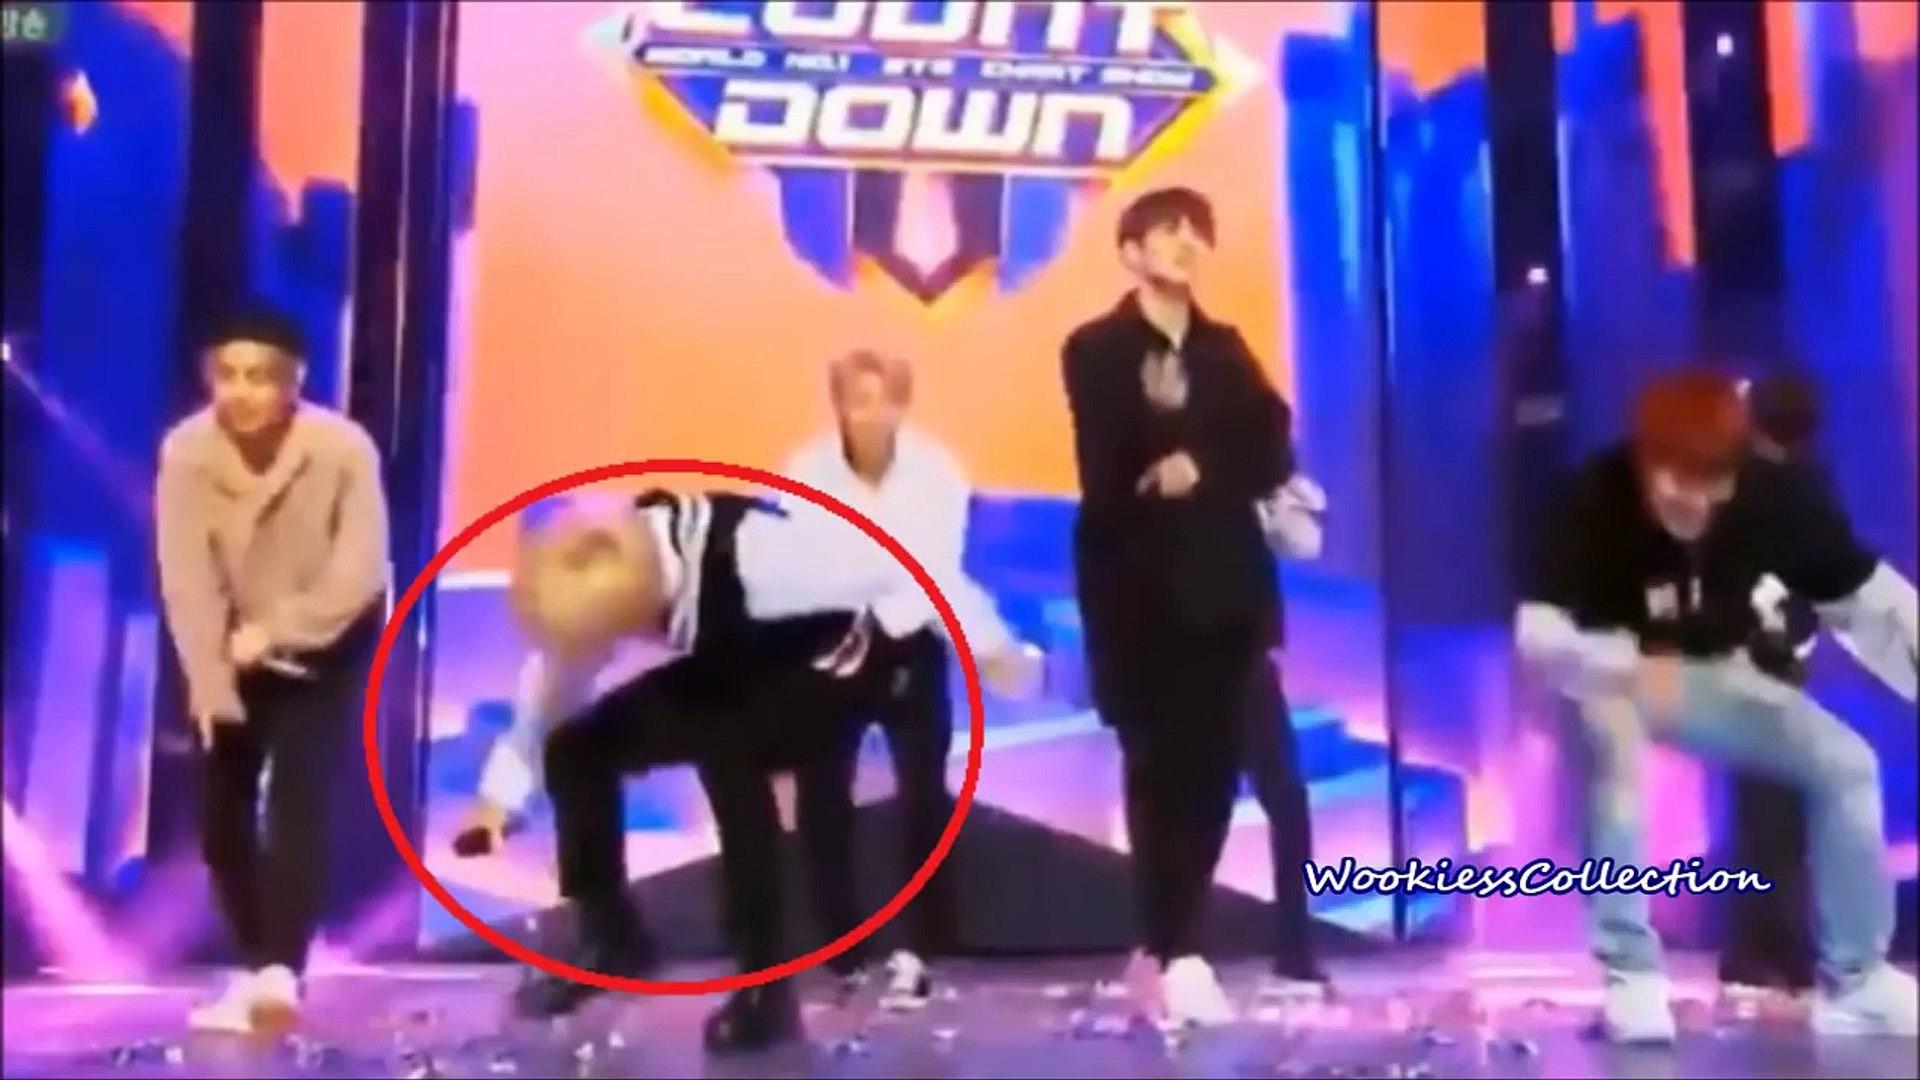 PART 341 - Kpop Mistake & Accident [BTS (Bangtan boys) 'DNA']-fjHIu3SW-bU